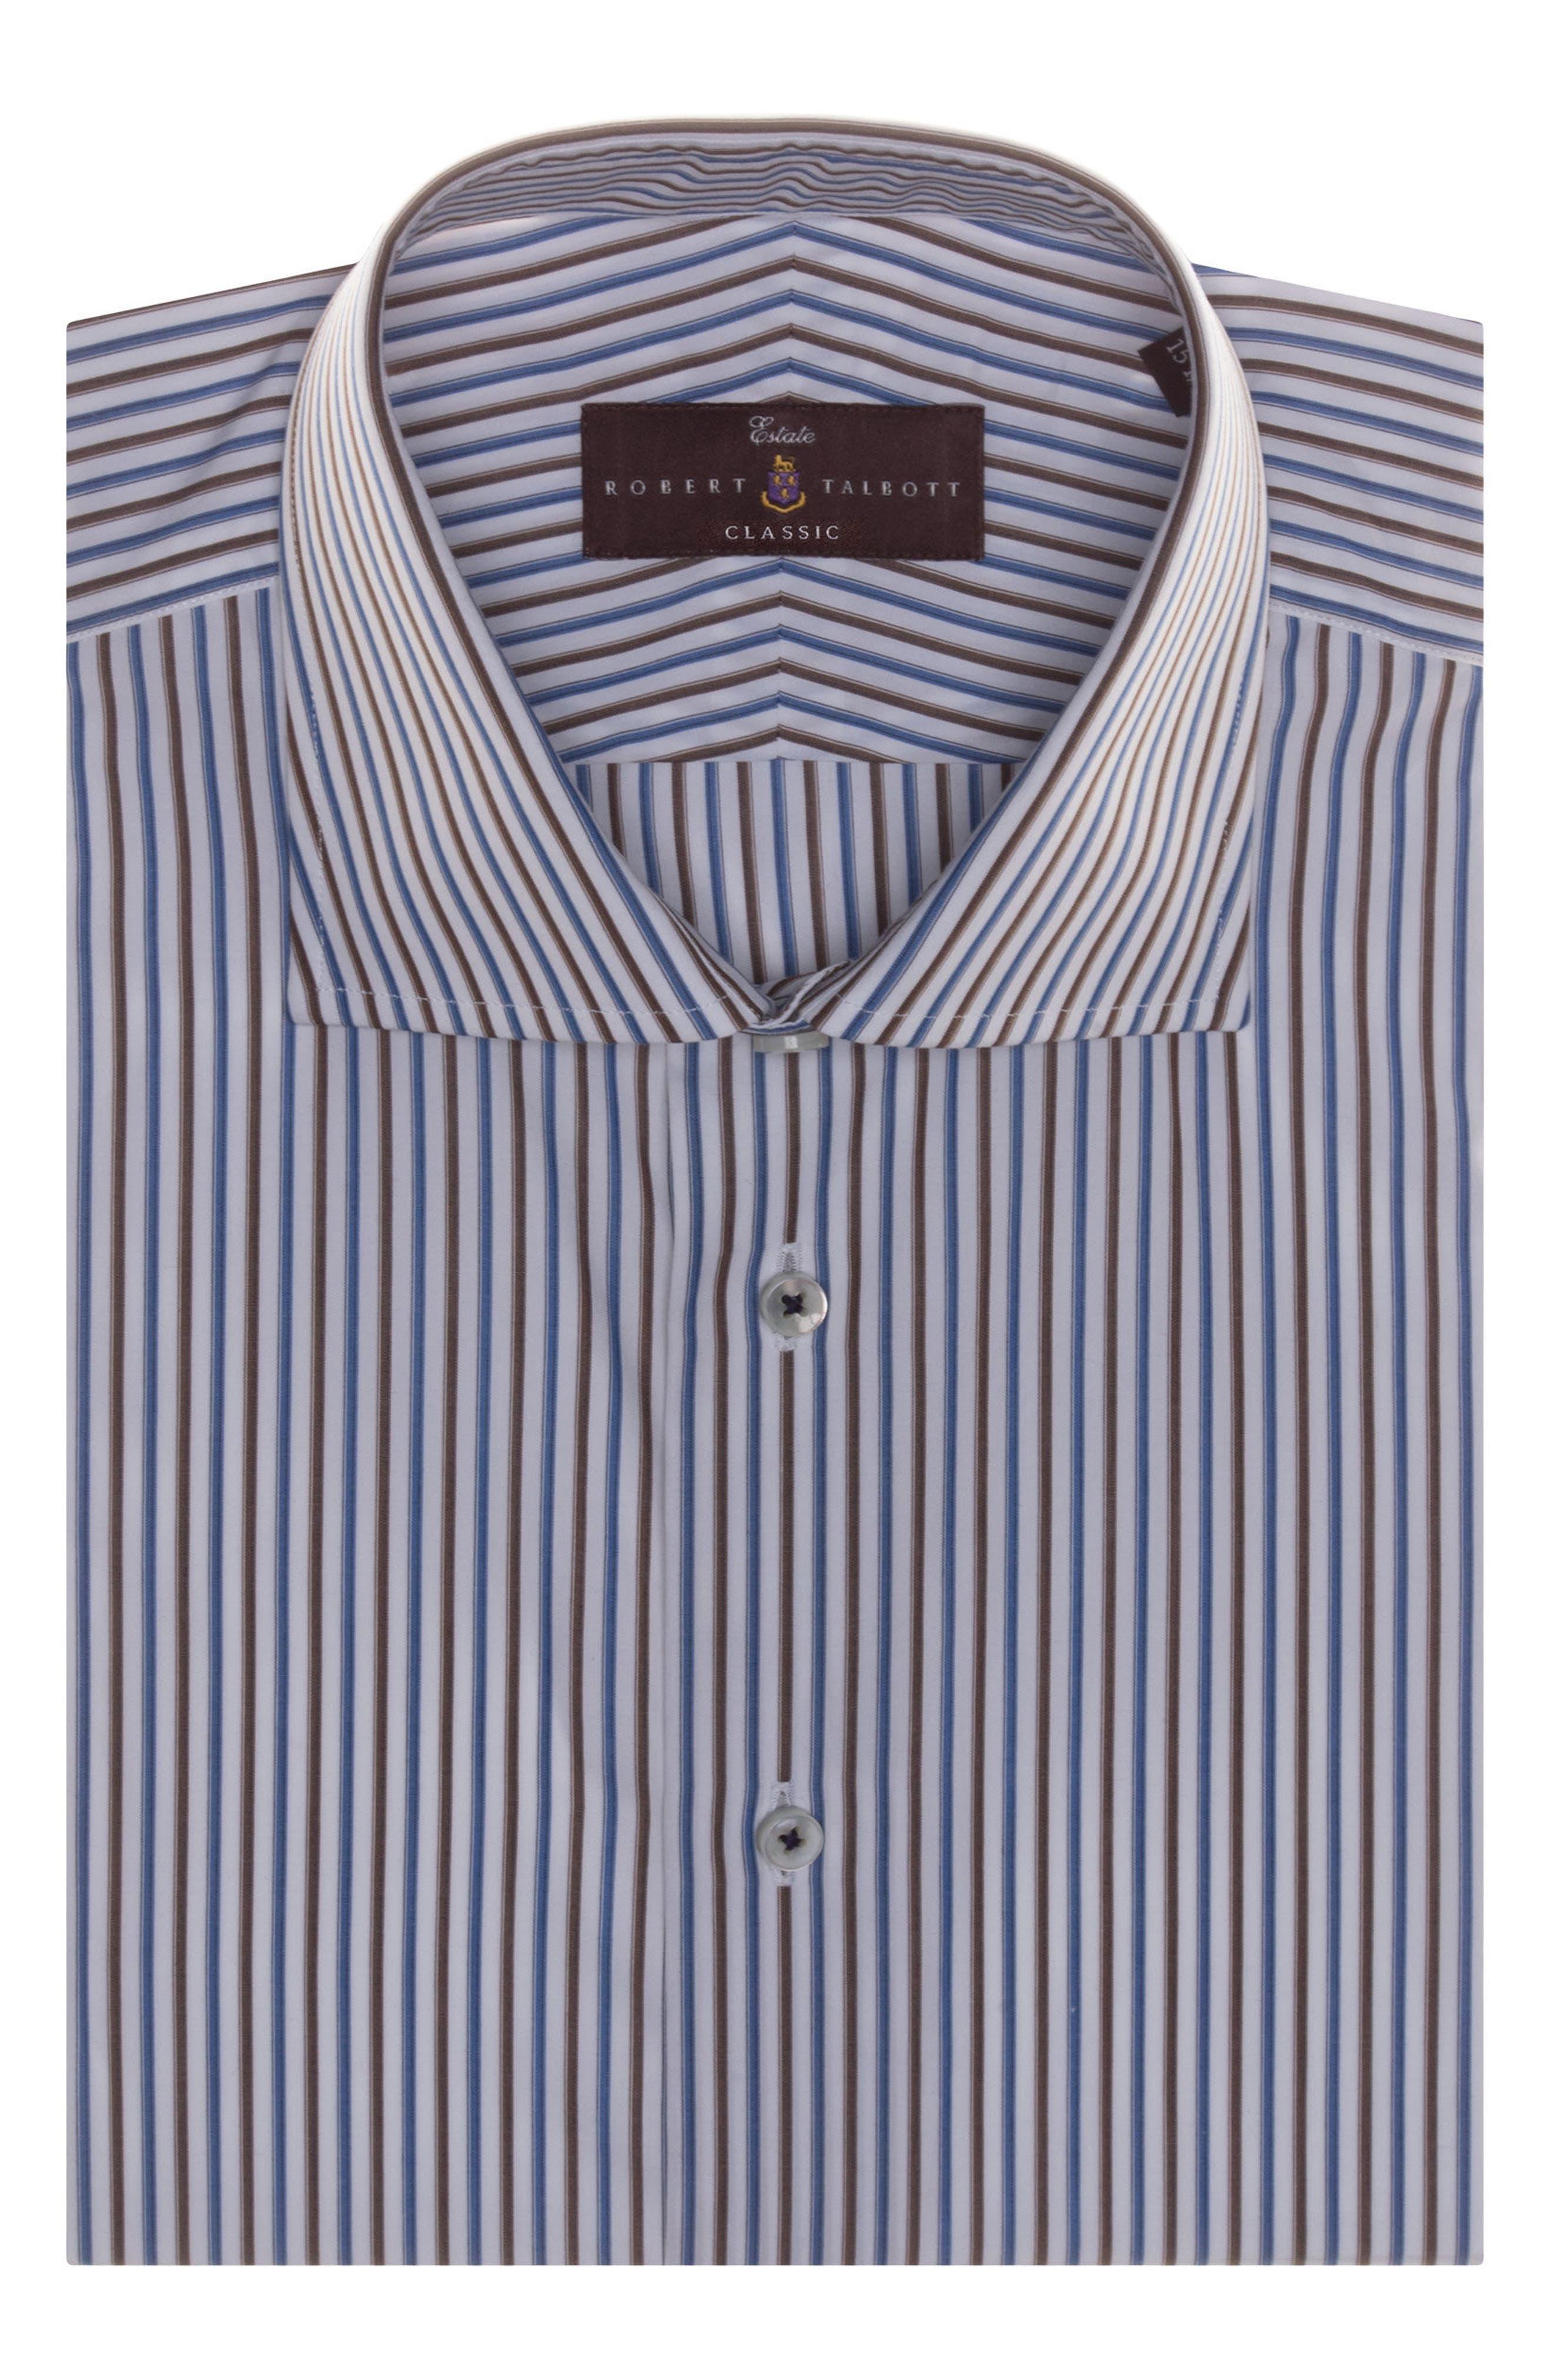 Main Image - Robert Talbott Tailored Fit Stripe Dress Shirt